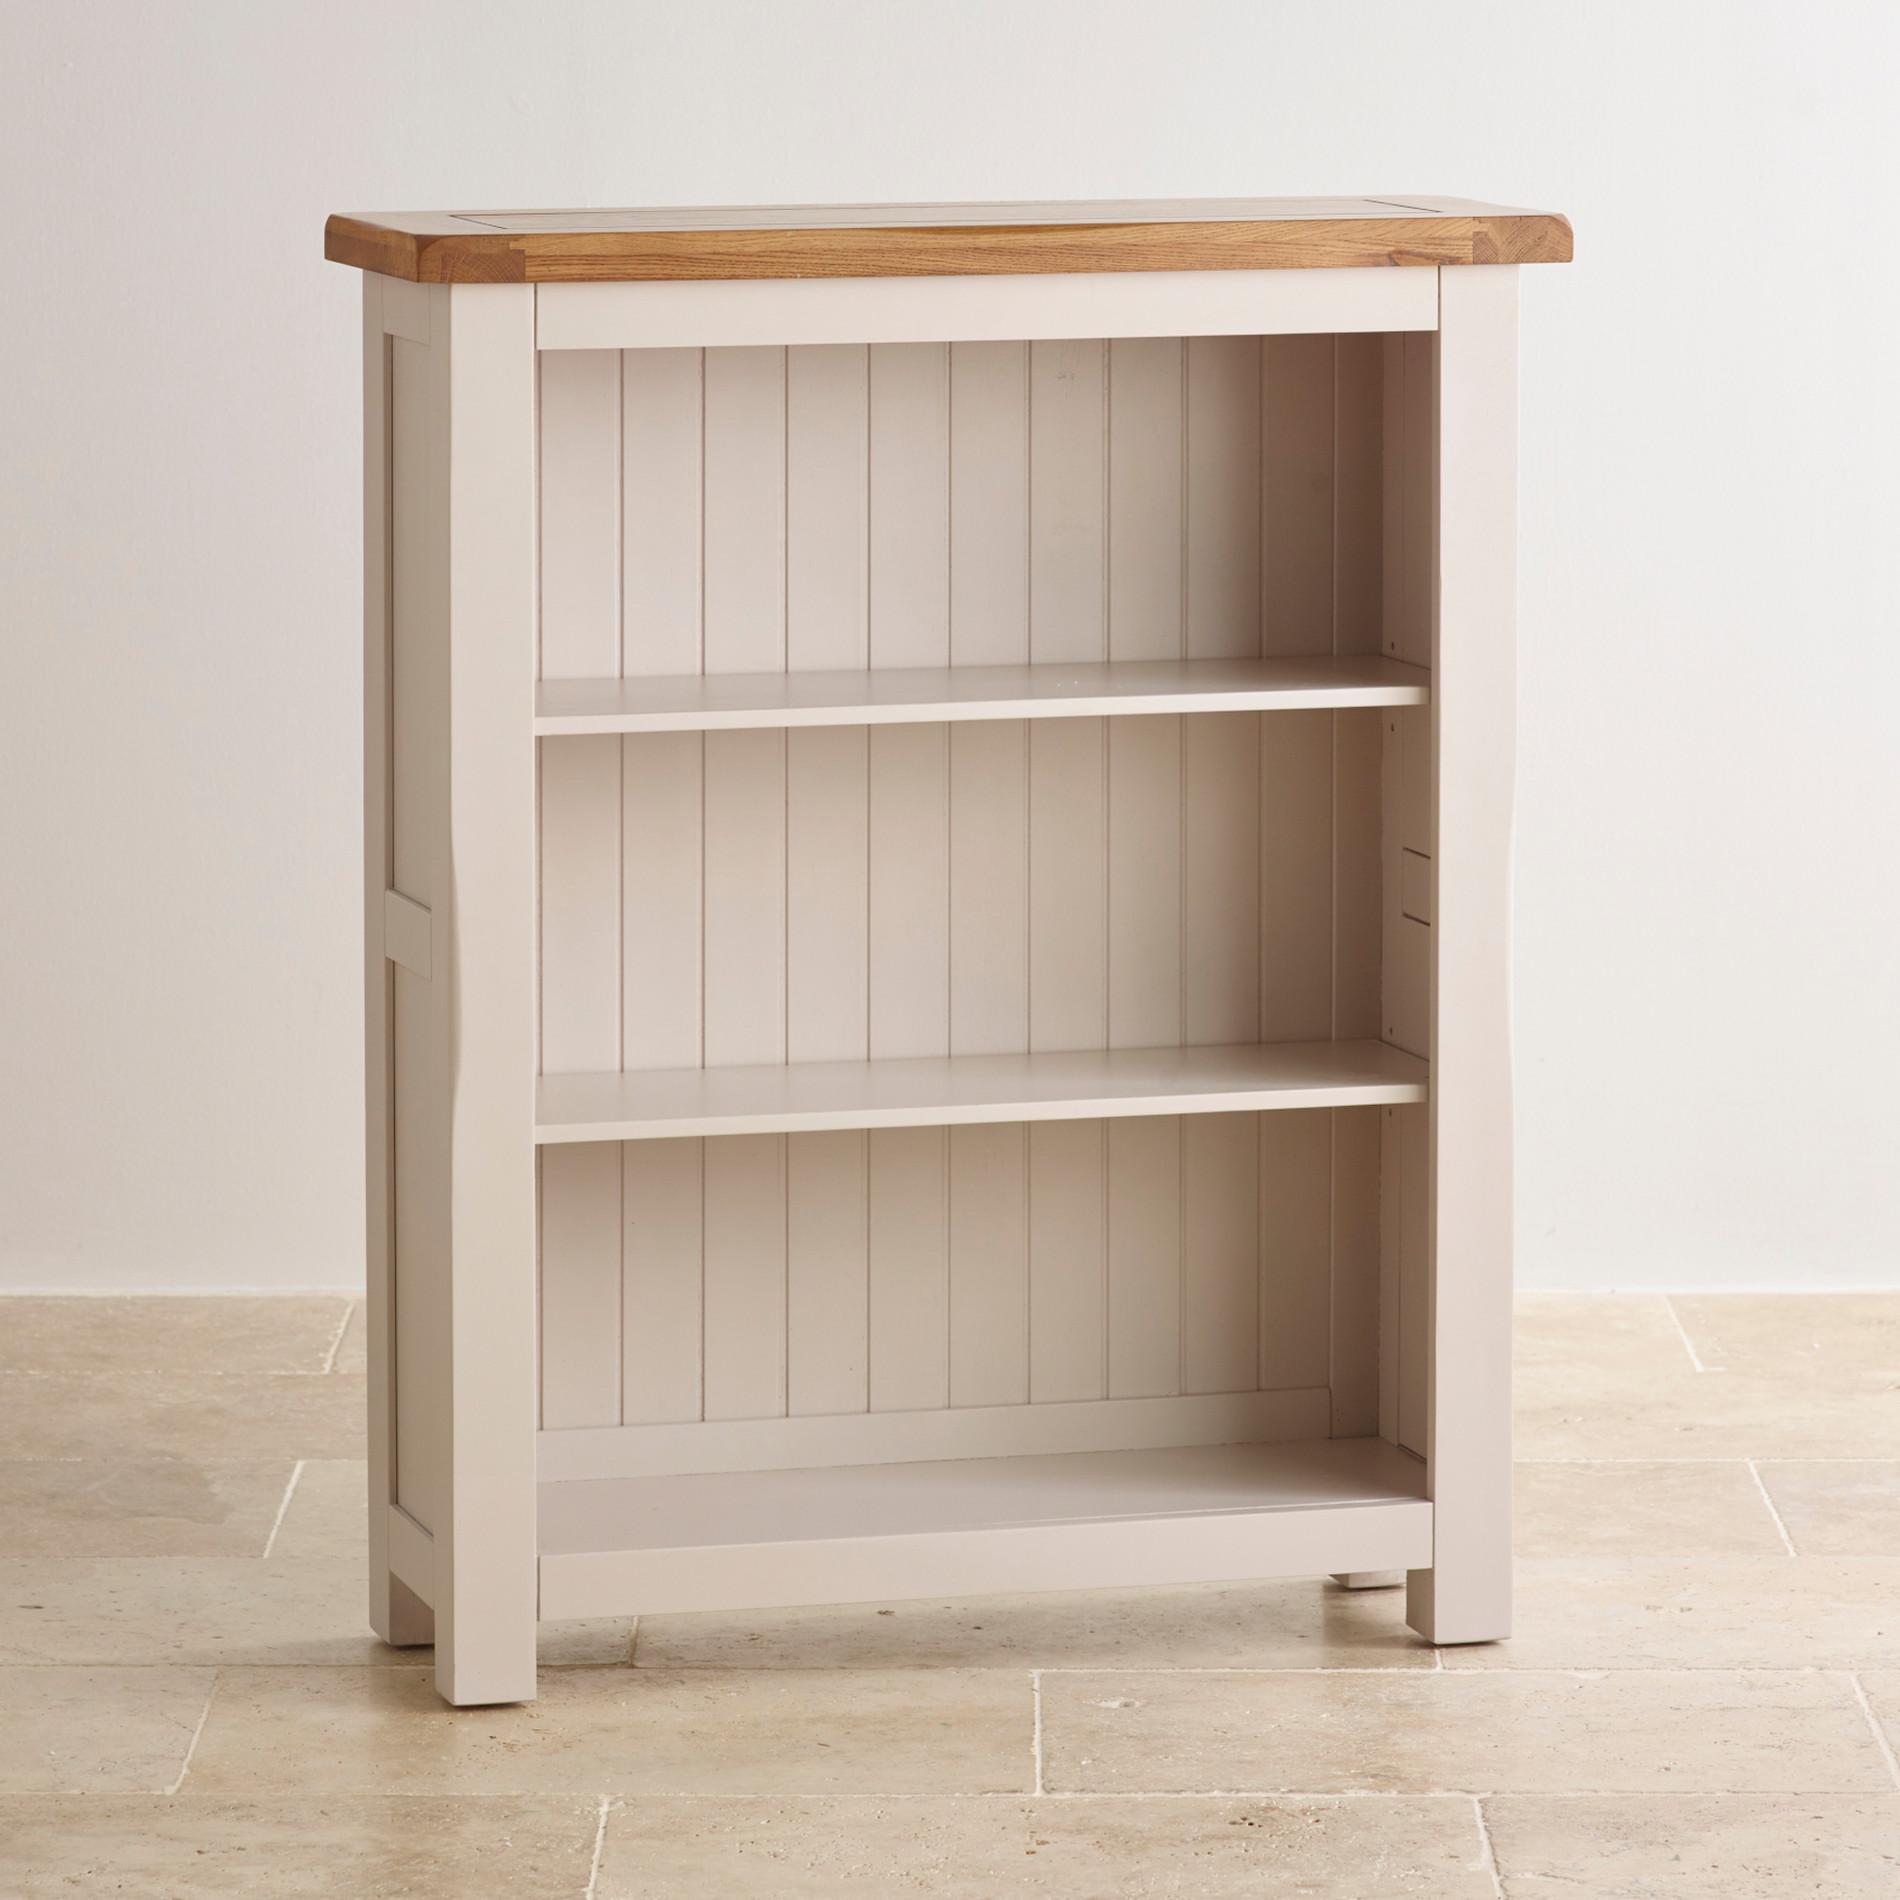 title | Small Bookshelf